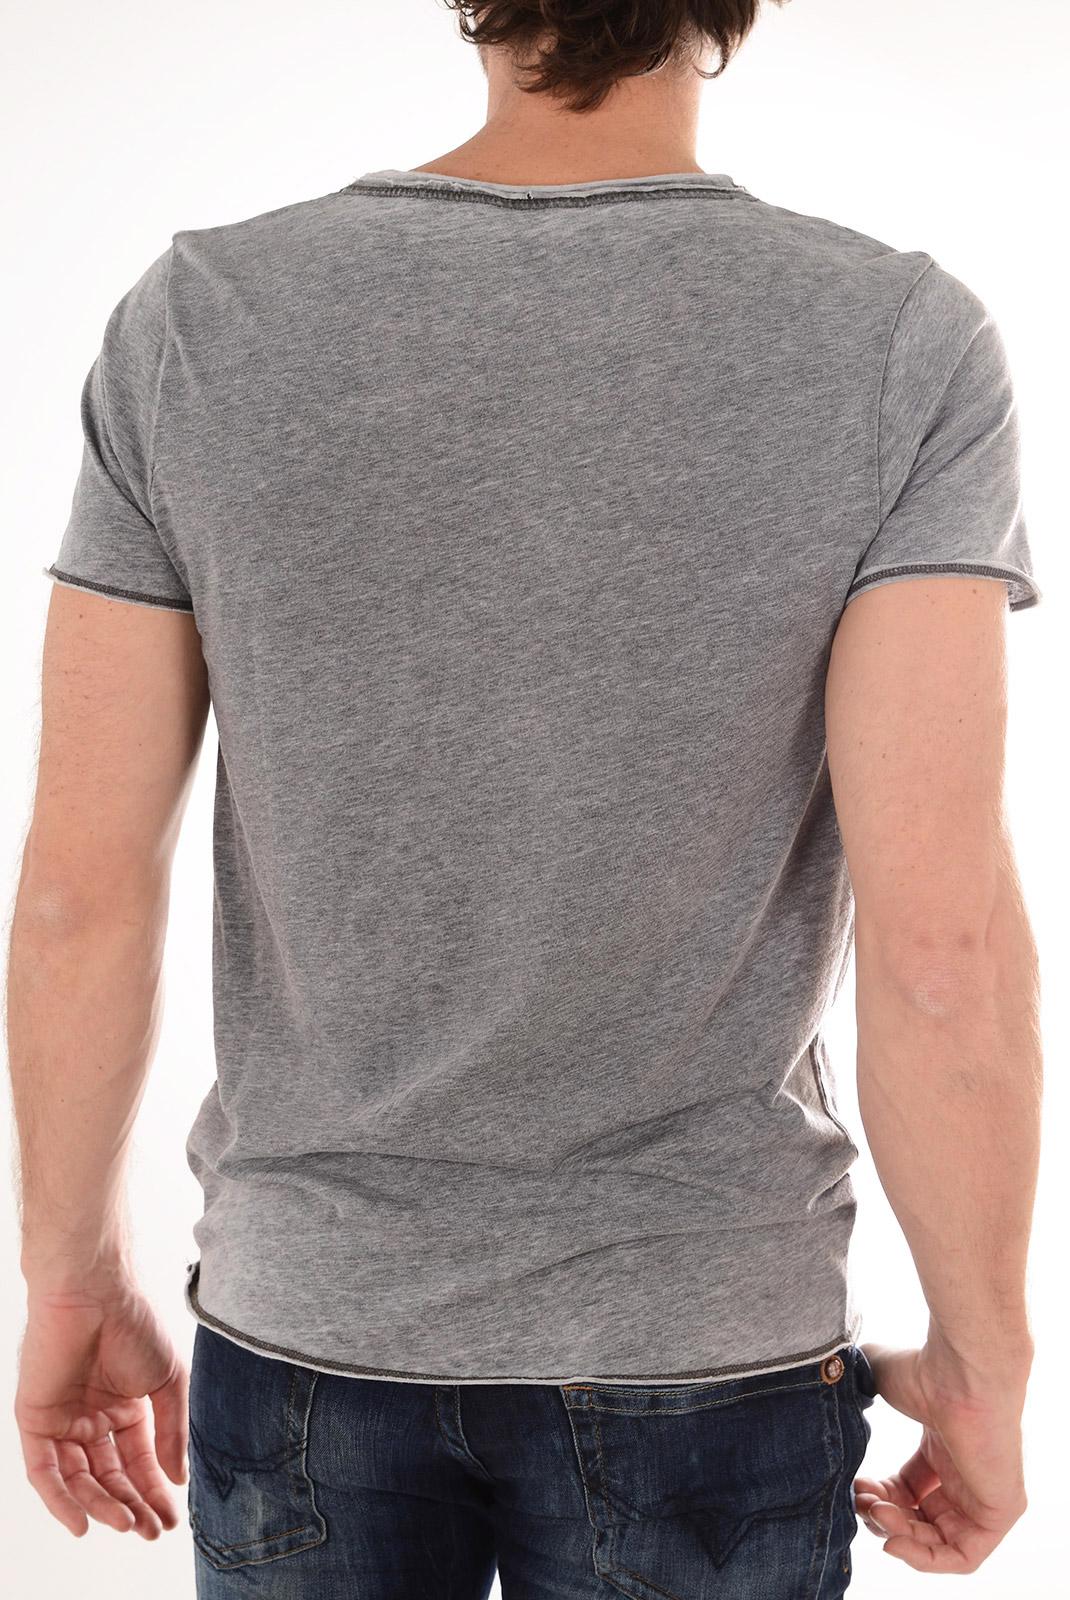 Tee-shirts  Selected SATURDAY SS O NECK PIRATE BLACK